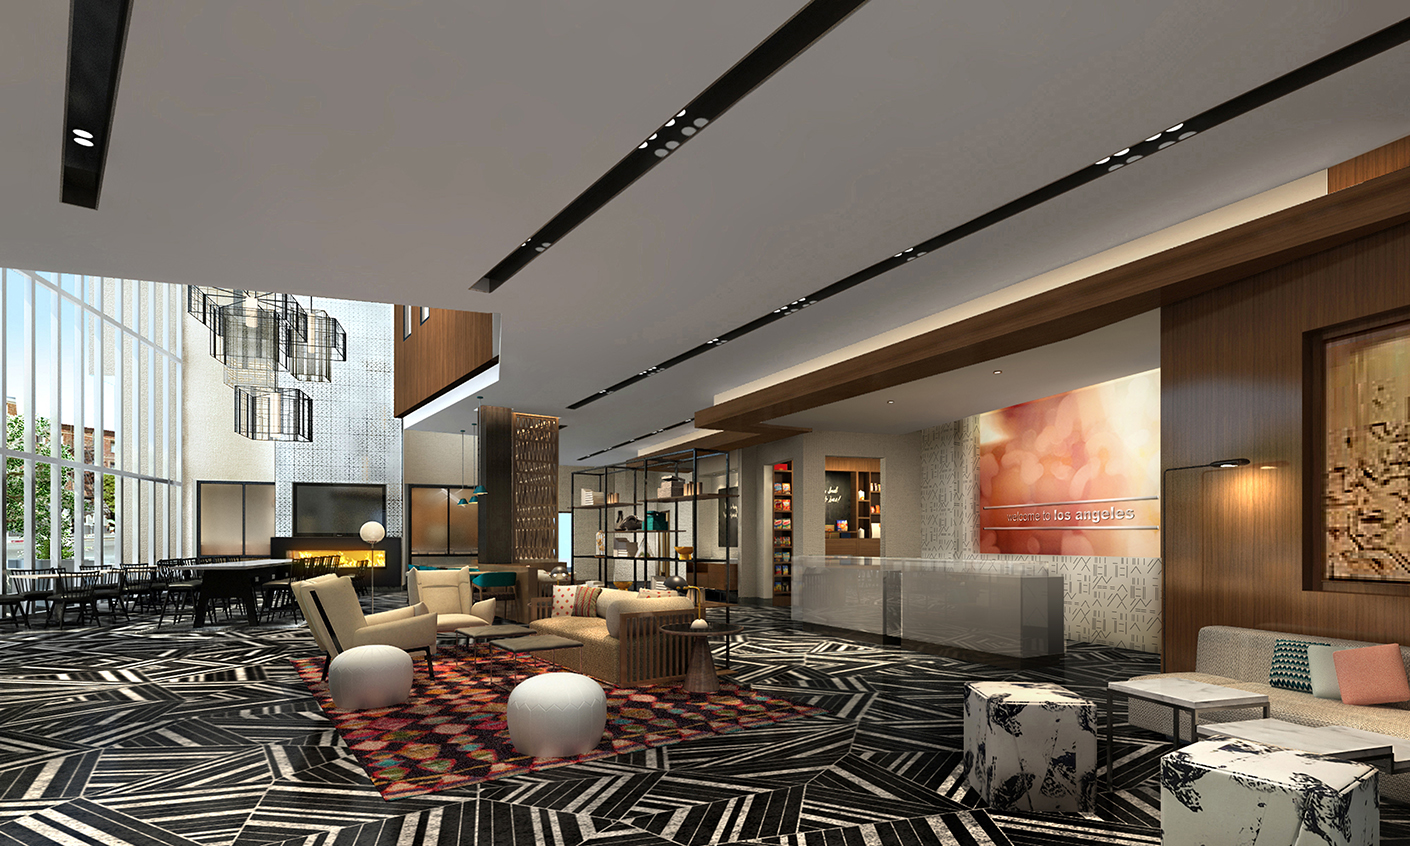 Hamptons Inn & Suites Lobby - Los Angeles, California